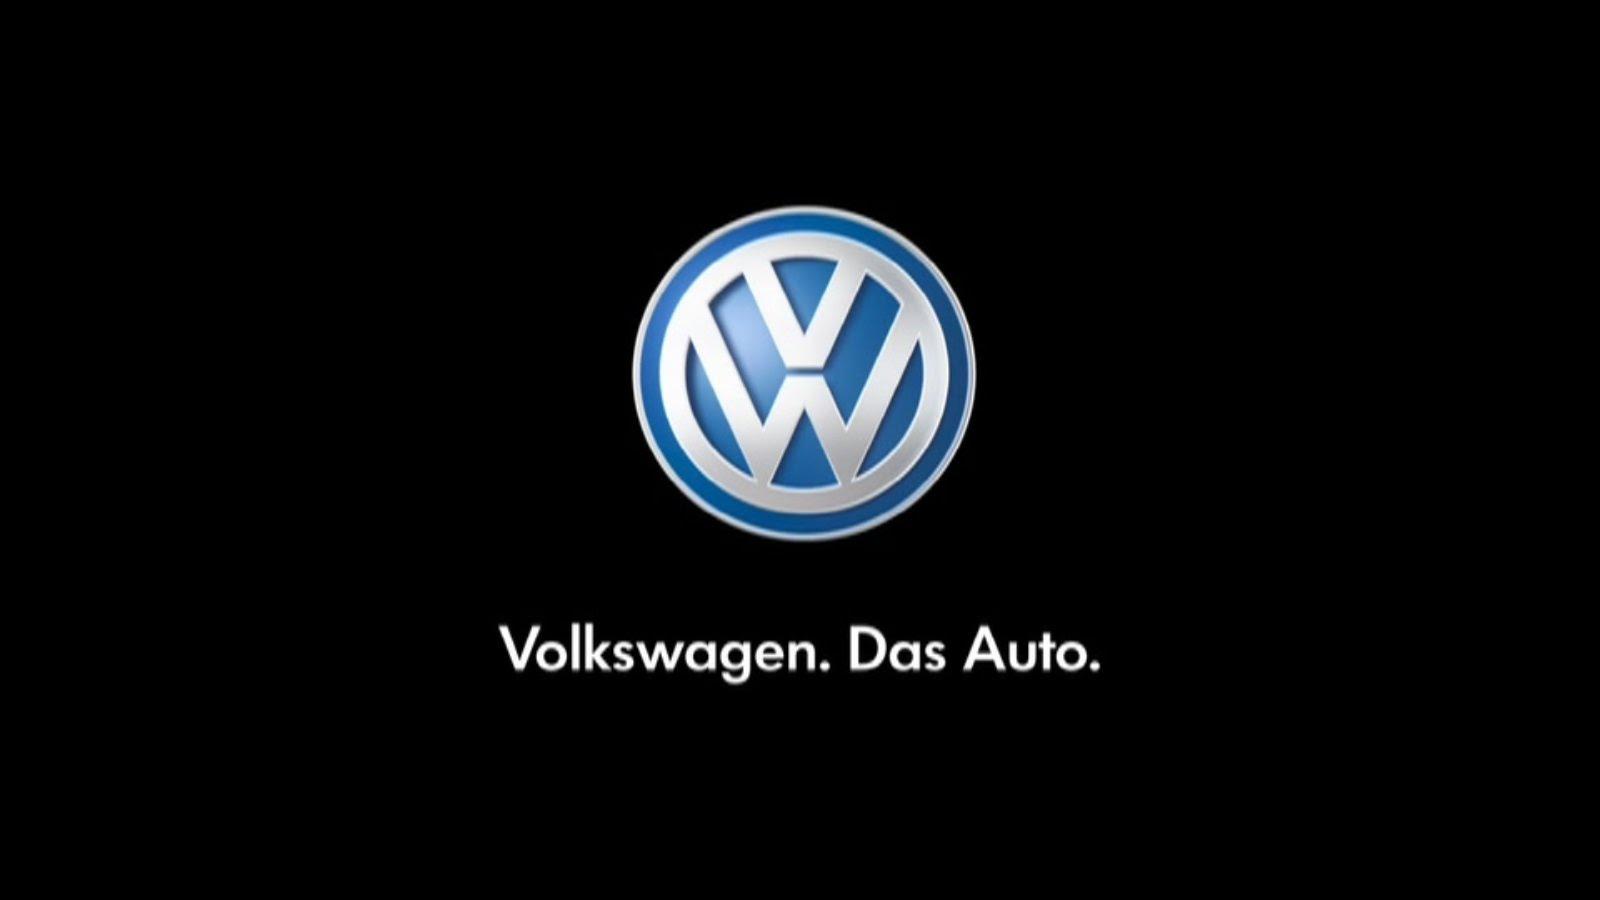 Hot cars VW das auto Volkswagen logo image volkswagen car company 1600x900